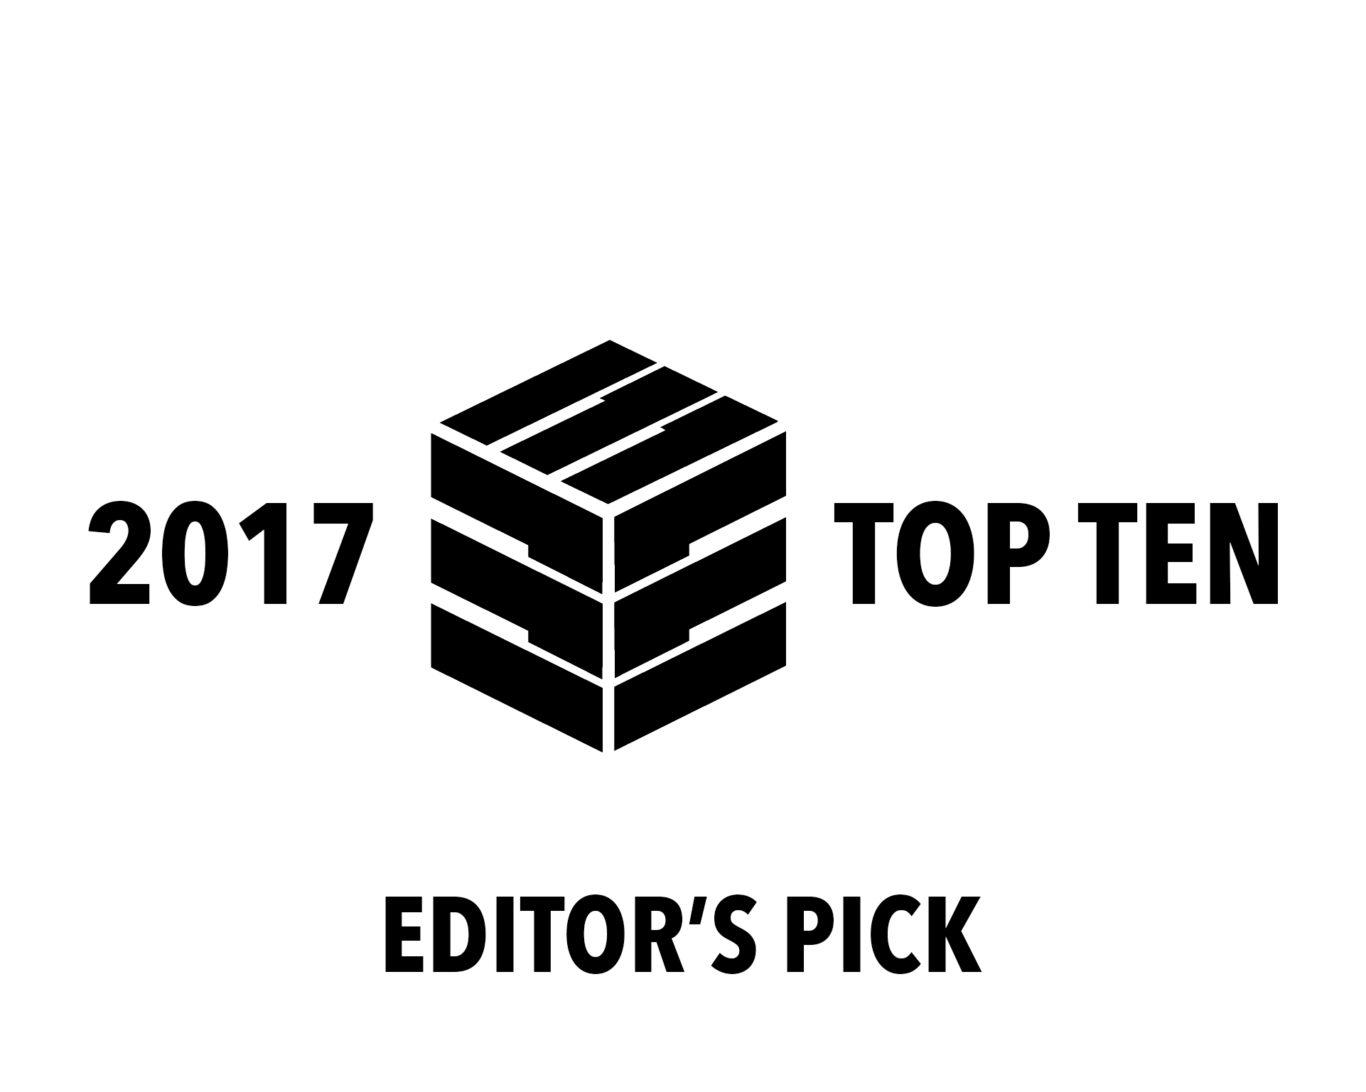 BE_MAG_TOP_TEN_BASIC_EDITORS_PICK